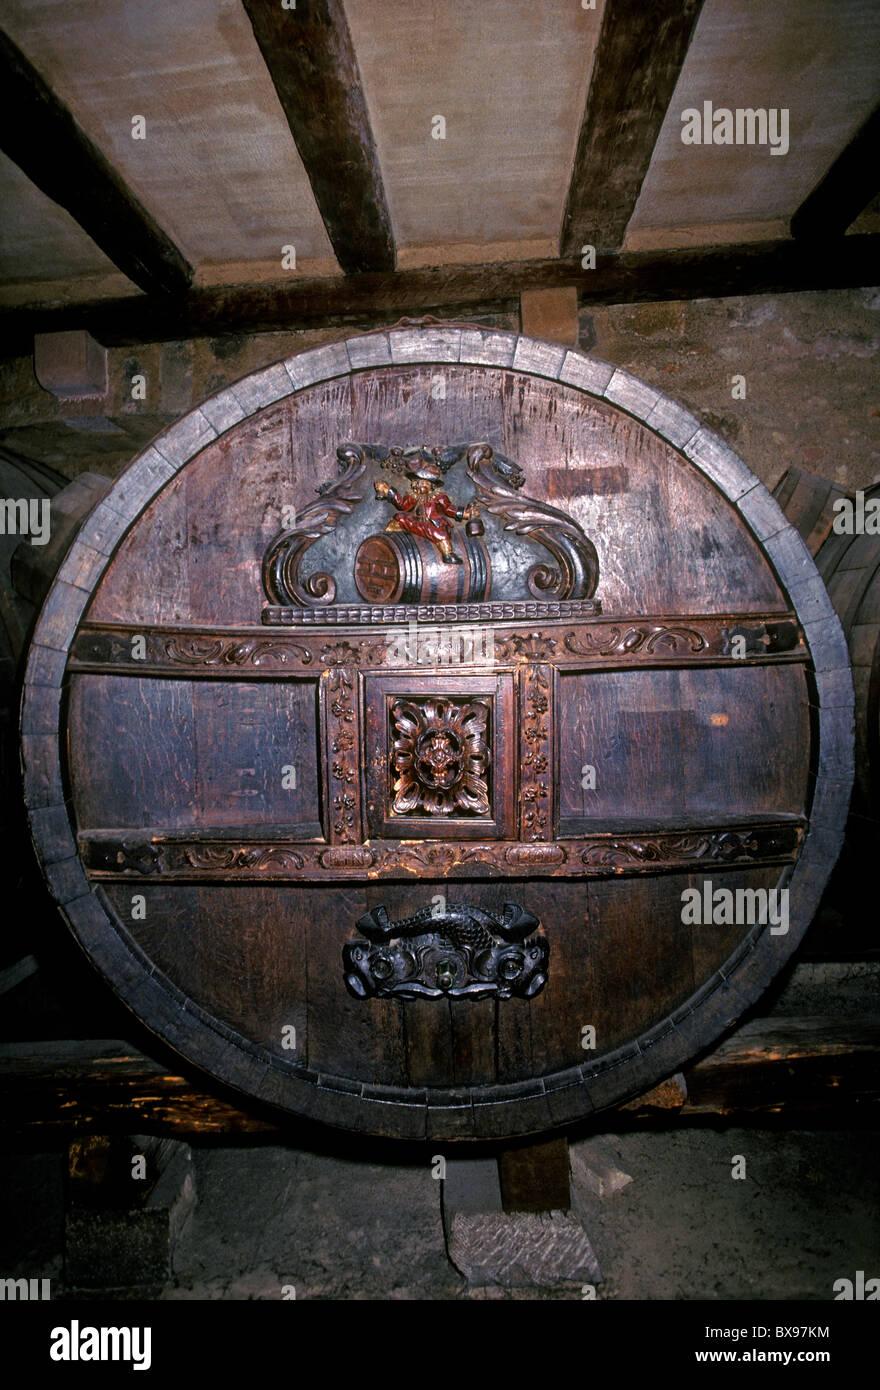 wine barrel, wooden wine barrel, circa 18th century, 18th century, Unterlinden Museum, Musee d'Unterlinden, - Stock Image